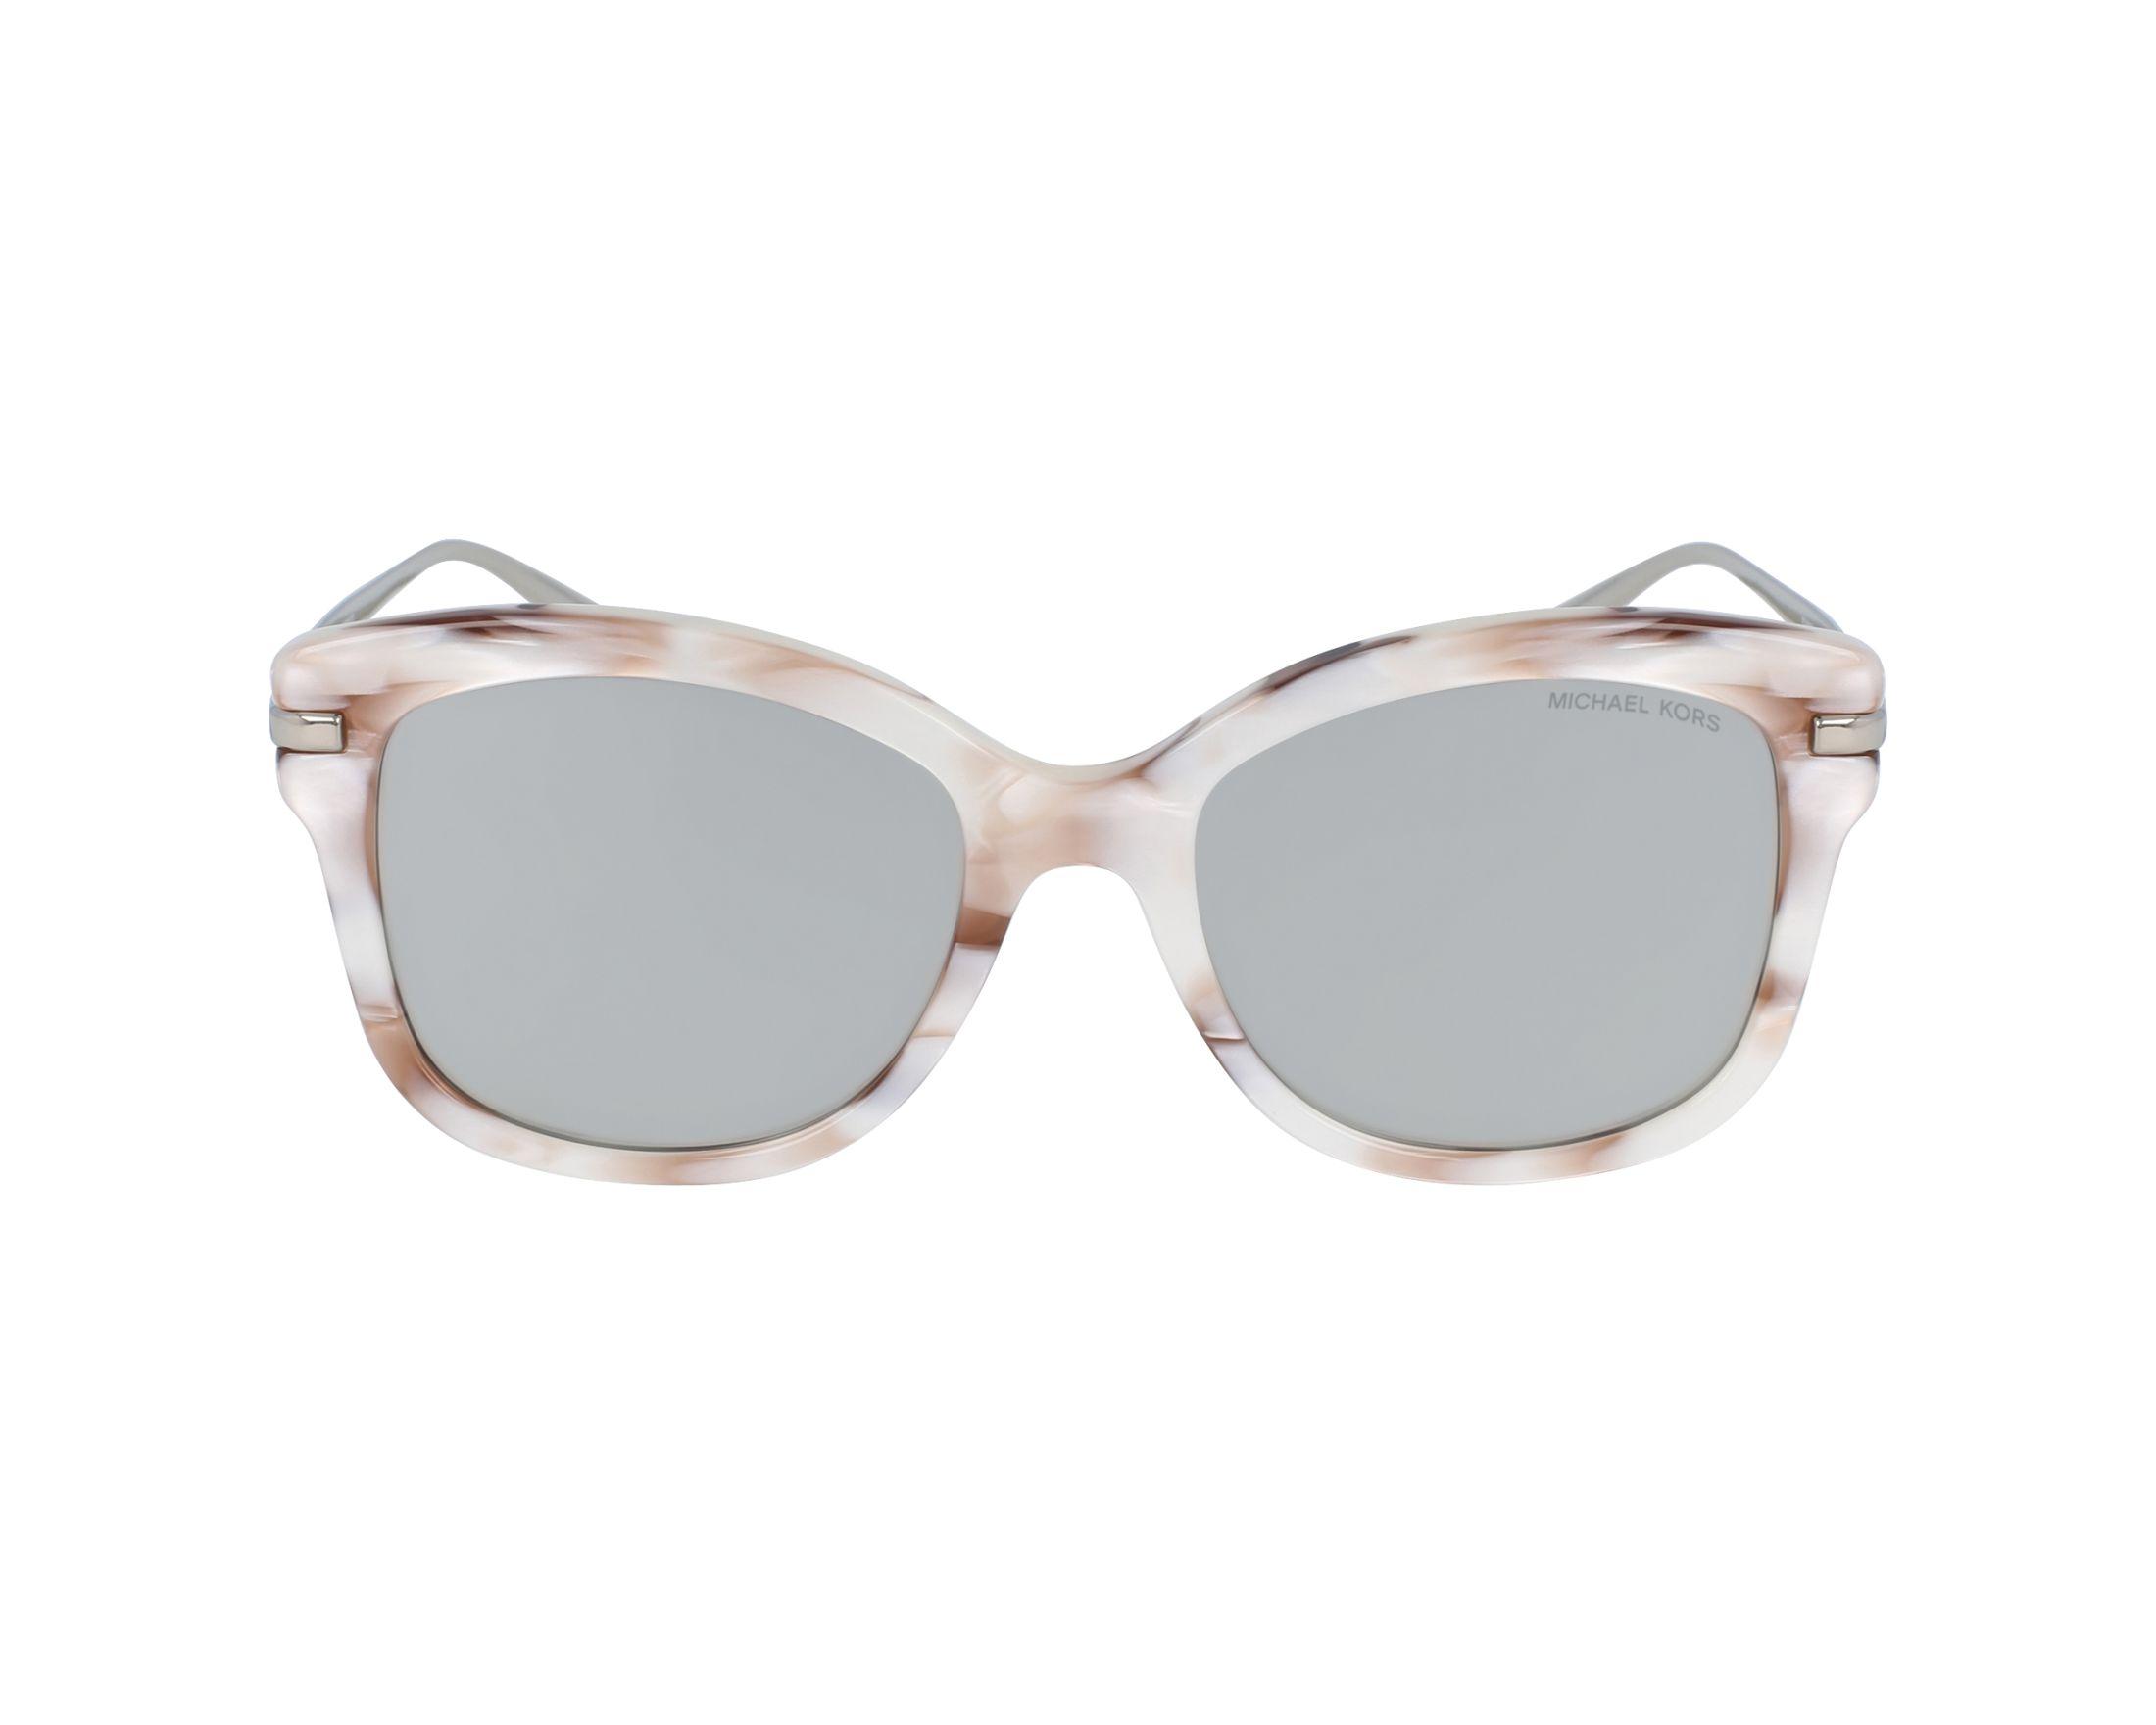 be438e677e Sunglasses Michael Kors MK-2047 32486G 53-18 White Brown profile view